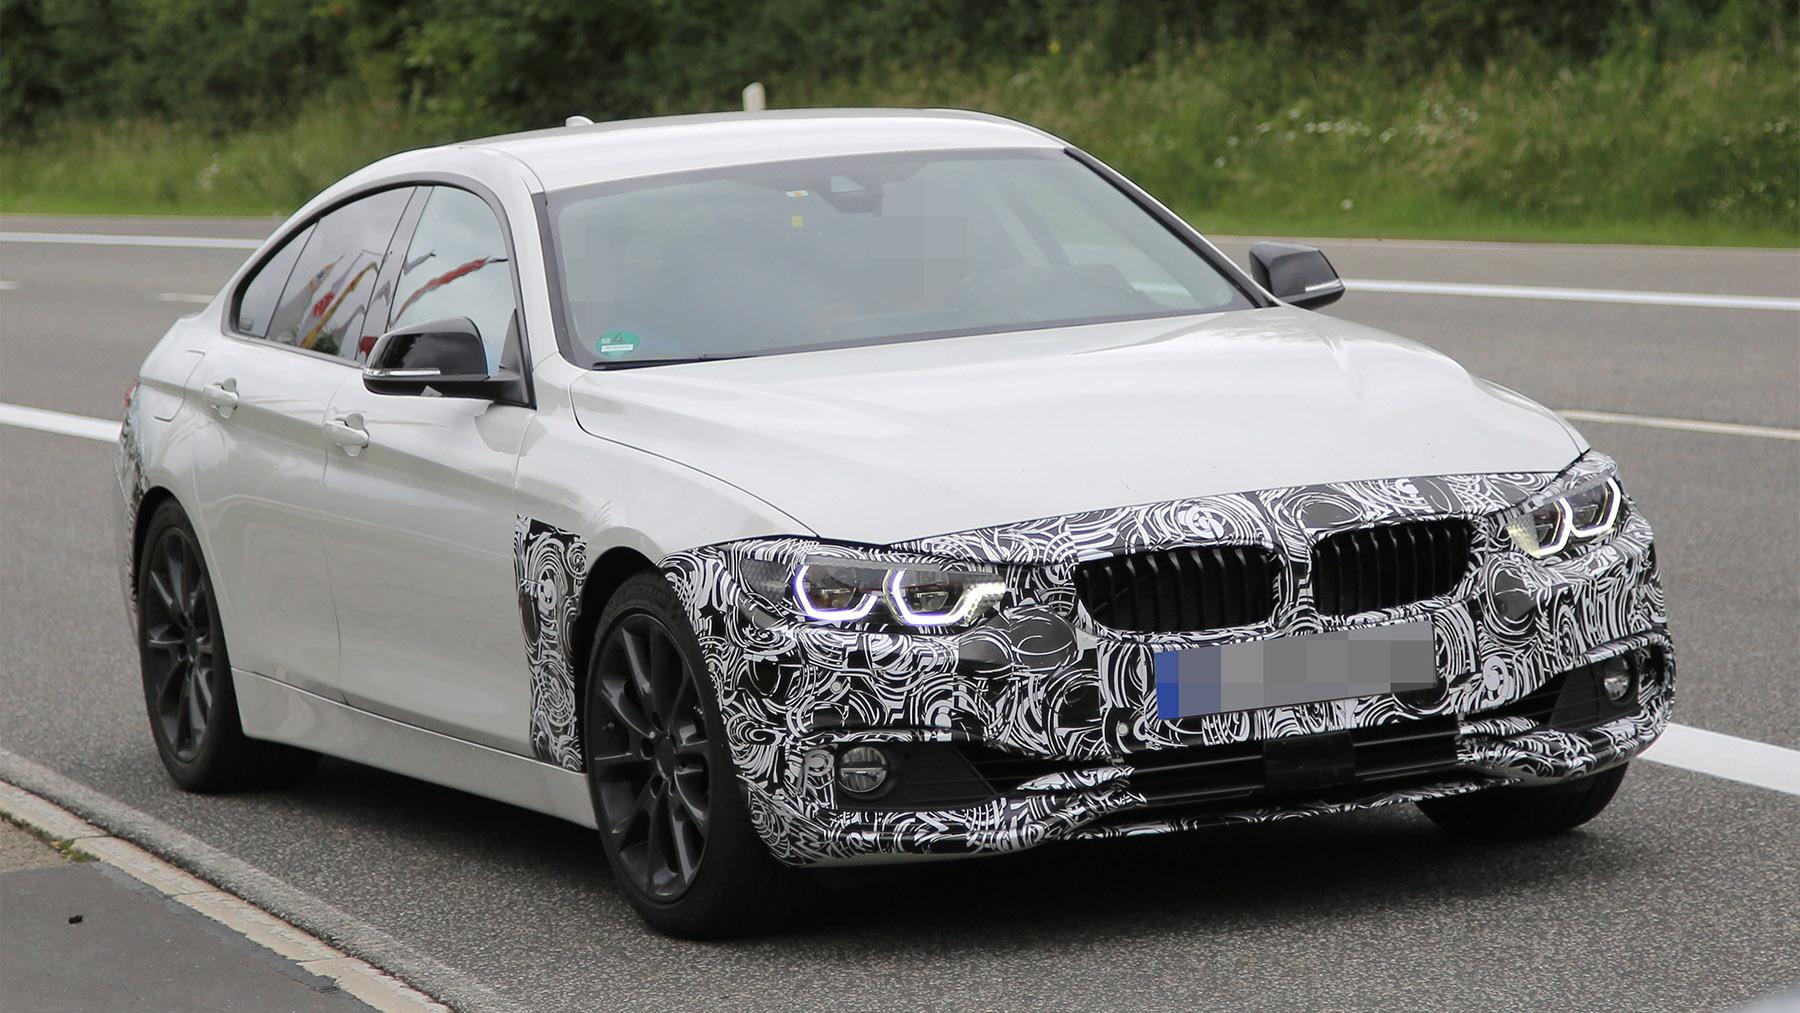 2018 BMW 4-Series Gran Coupe facelift spy shots - Image via S. Baldauf/SB-Medien